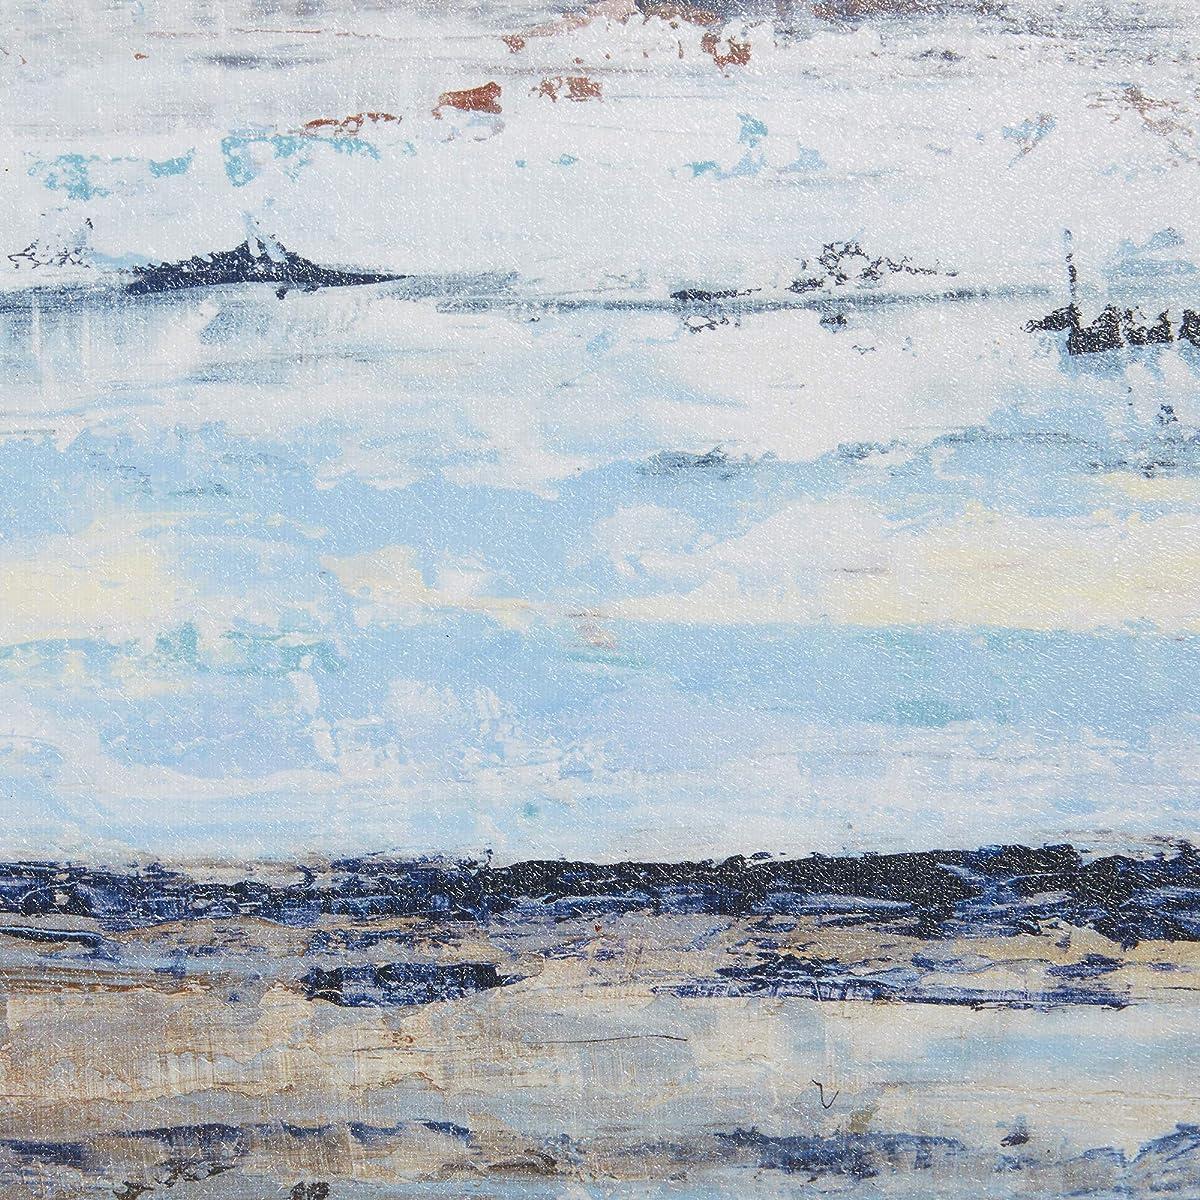 Blue Bliss Blue Grey Framed Canvas Wall Art 19.6X19.6 3 PieceMulti Panel , Novelty Modern / Contemporary Wall Décor